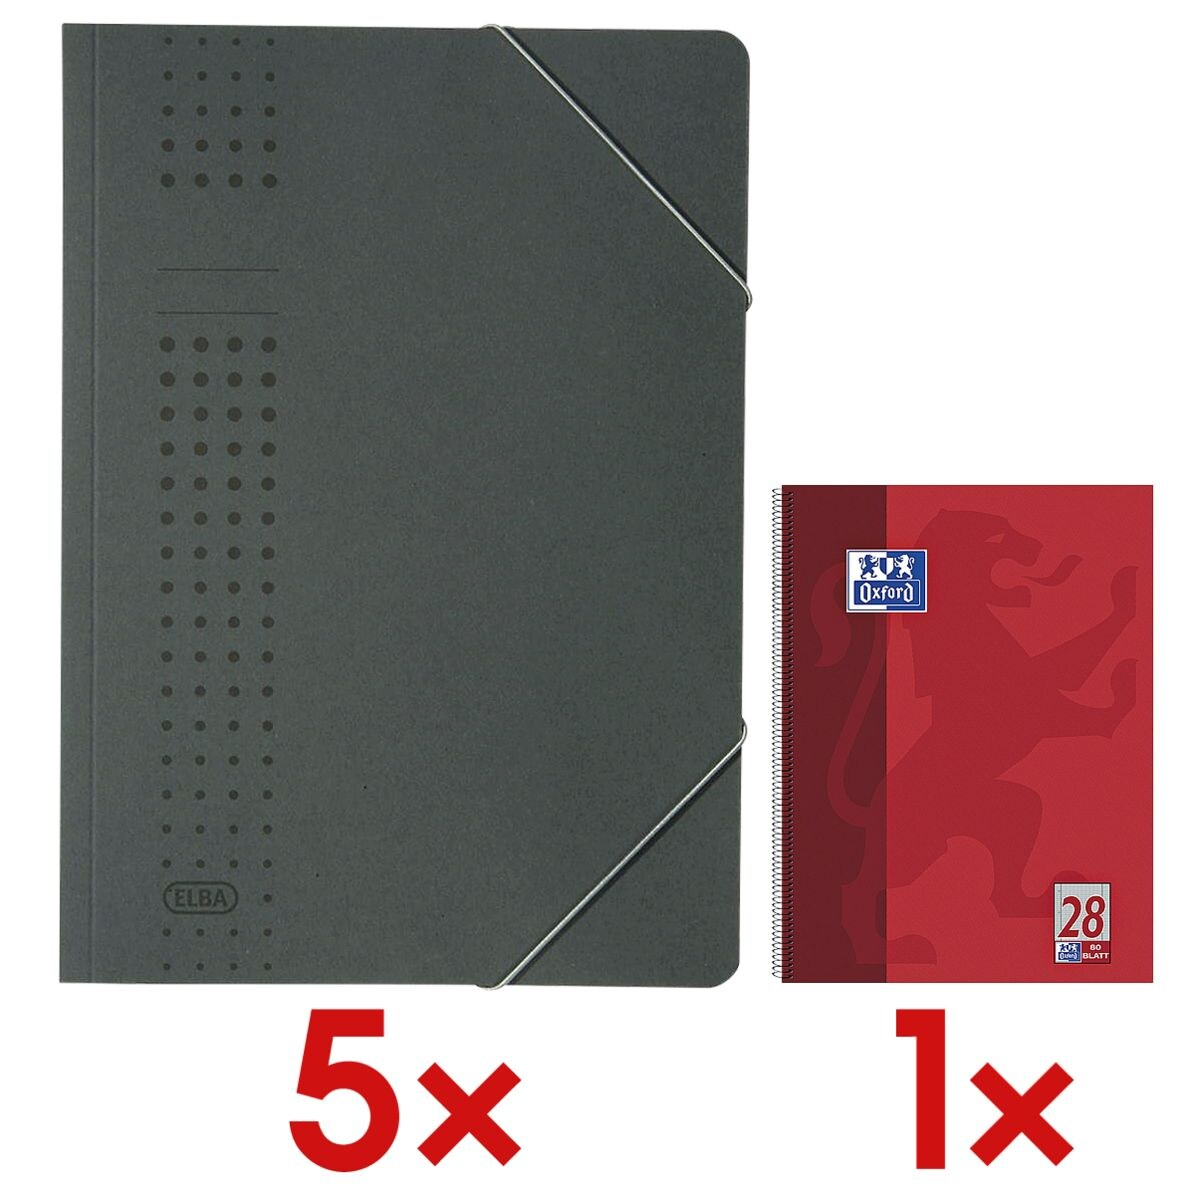 Elba 5x Eckspannermappe A4 »chic« 400010 320 g/m²-Karton inkl. Collegeblock »Schule« A4 kariert